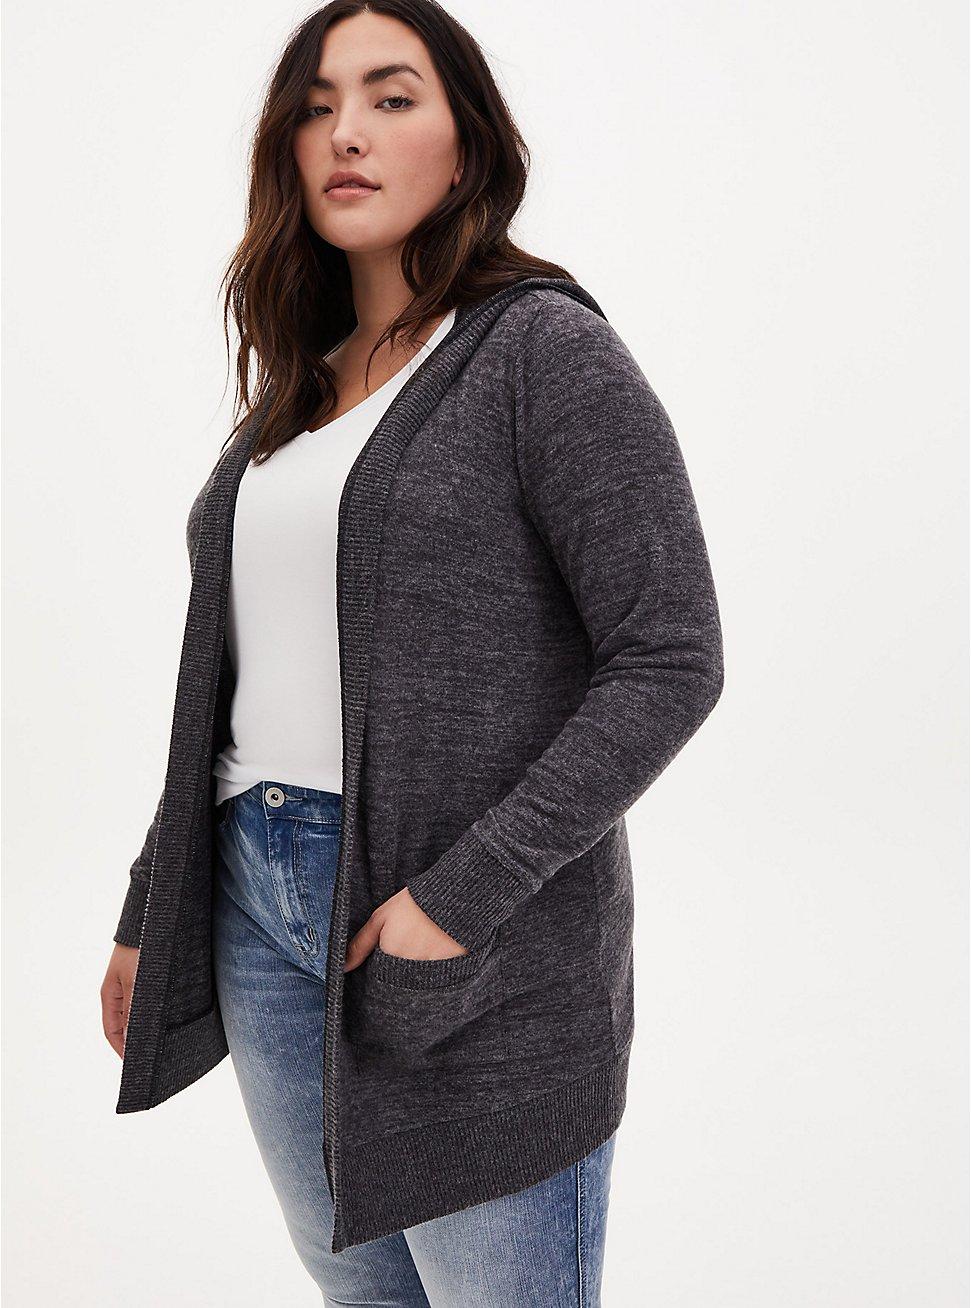 Plus Size Super Soft Plush Charcoal Grey Hooded Cardigan, CHARCOAL  GREY, hi-res